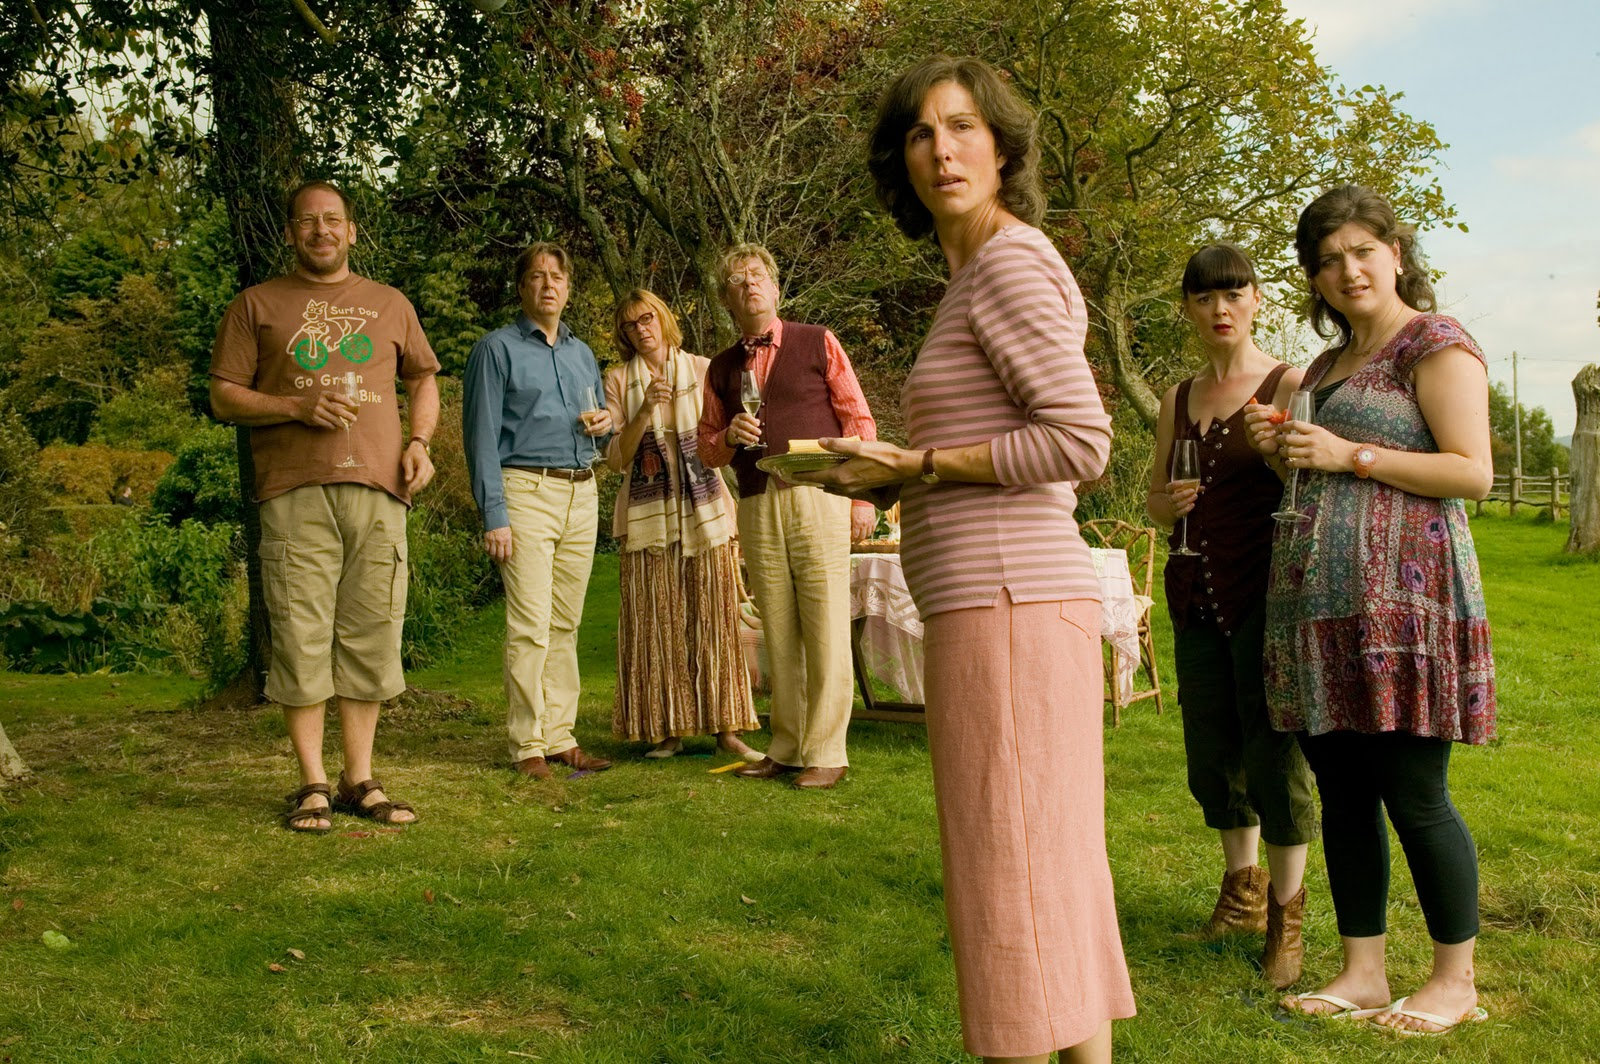 Toronto International Film Festival 2010: Tamara Drewe, 13 Assassins, & Norwegian Wood